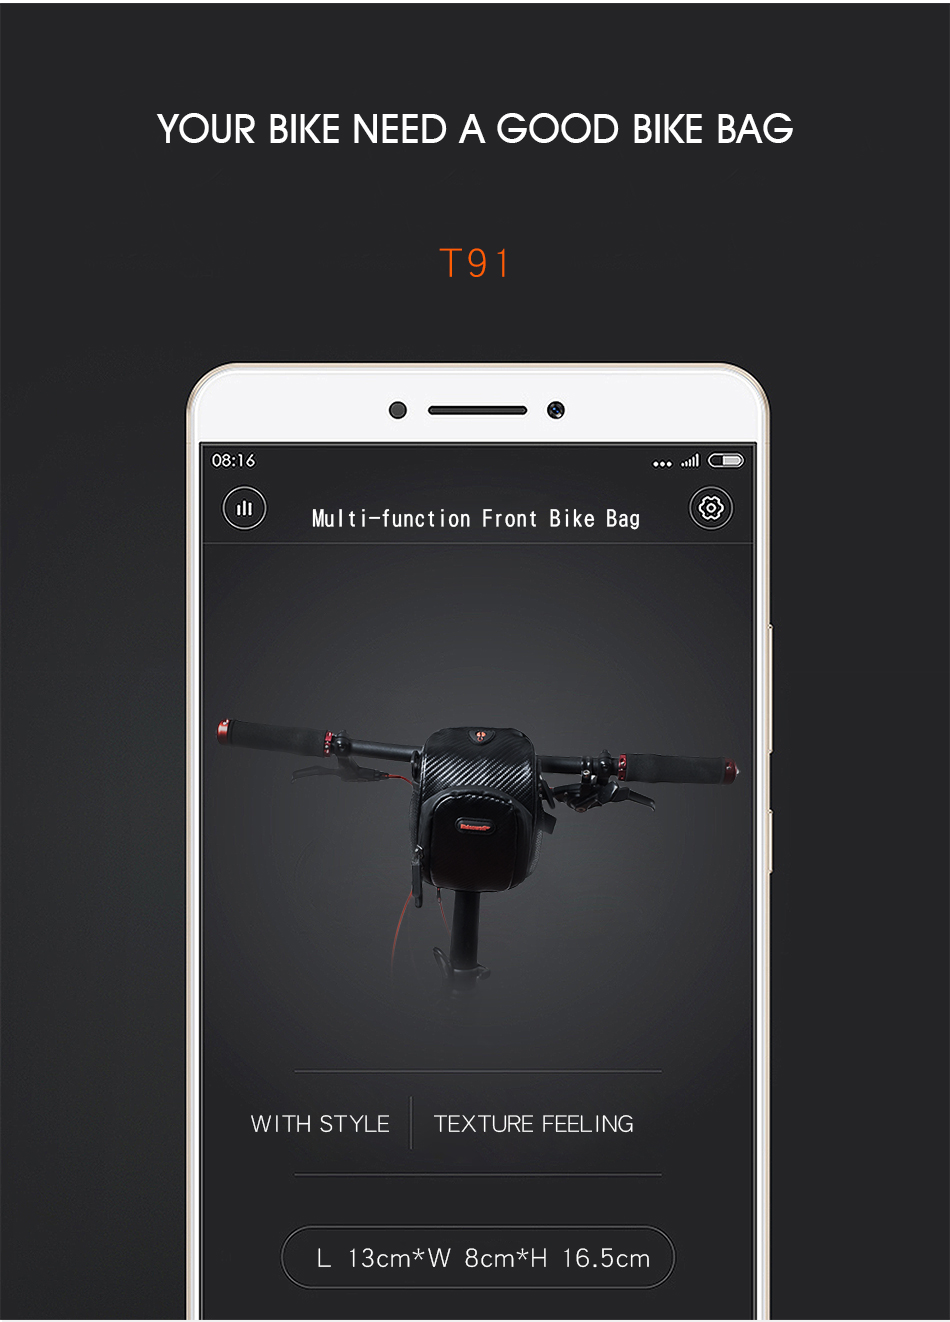 T91-950--2017_09